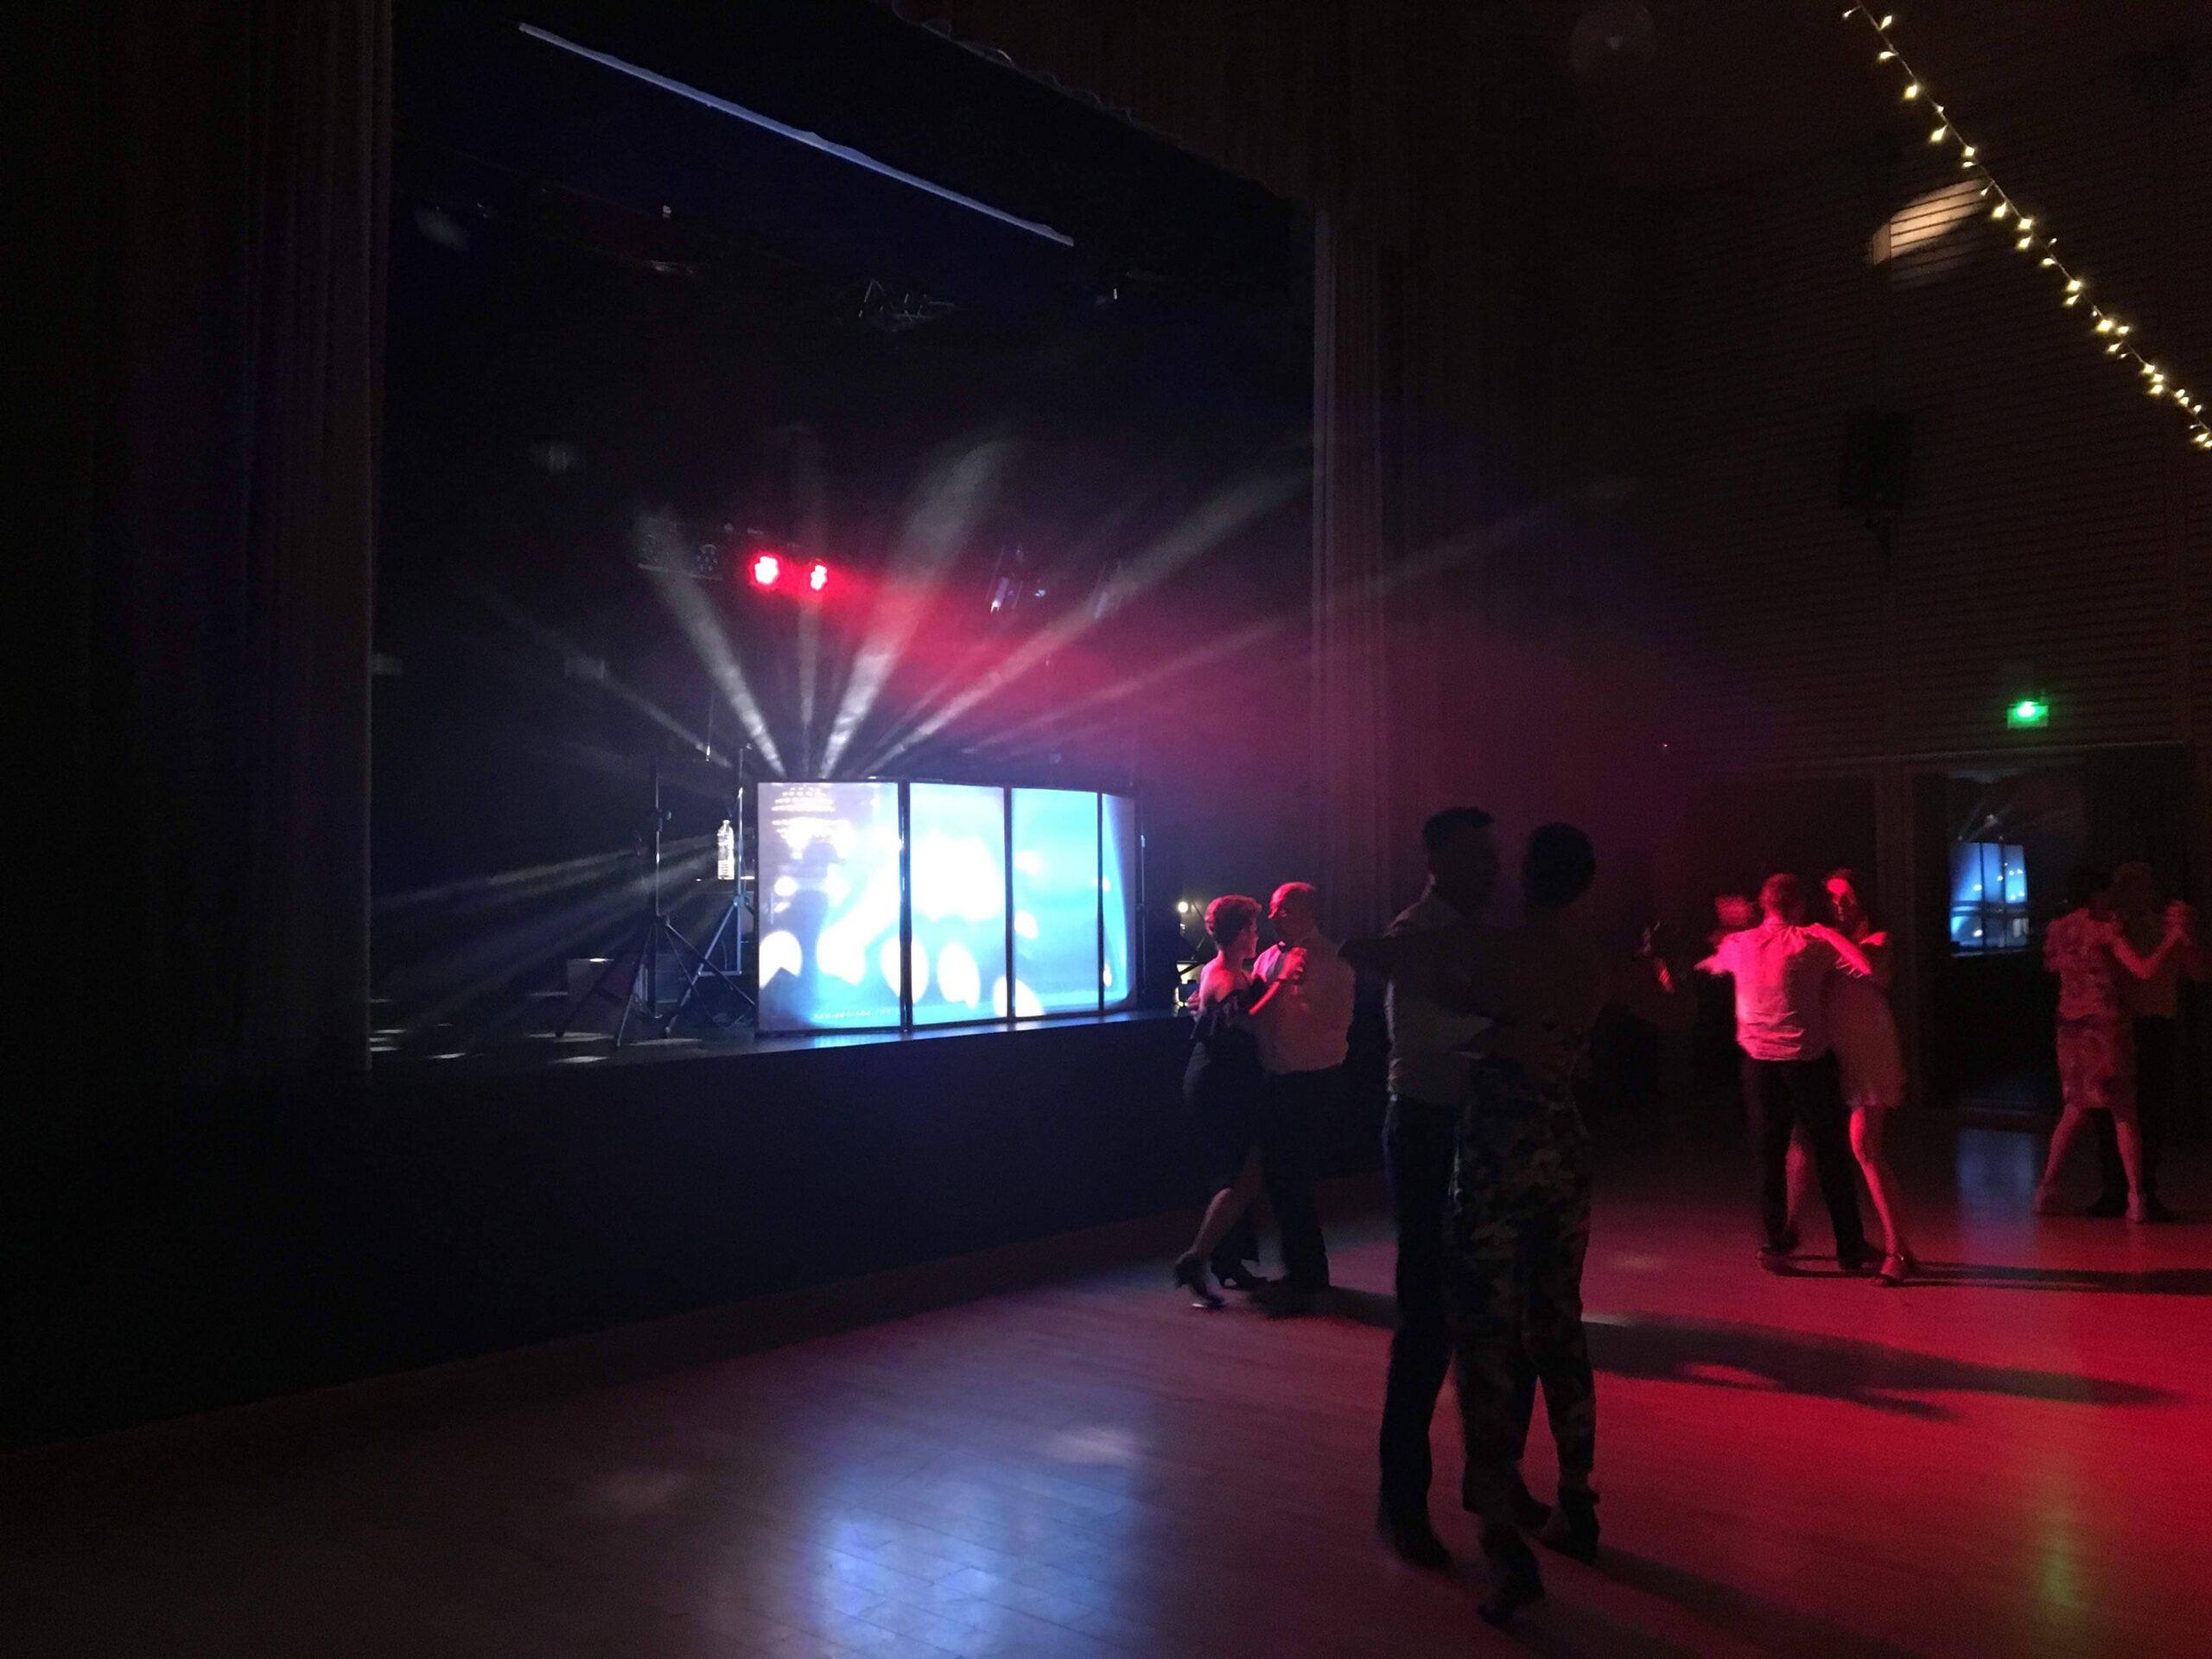 Salle des fêtes de Auenheim 67 Bas-Rhin